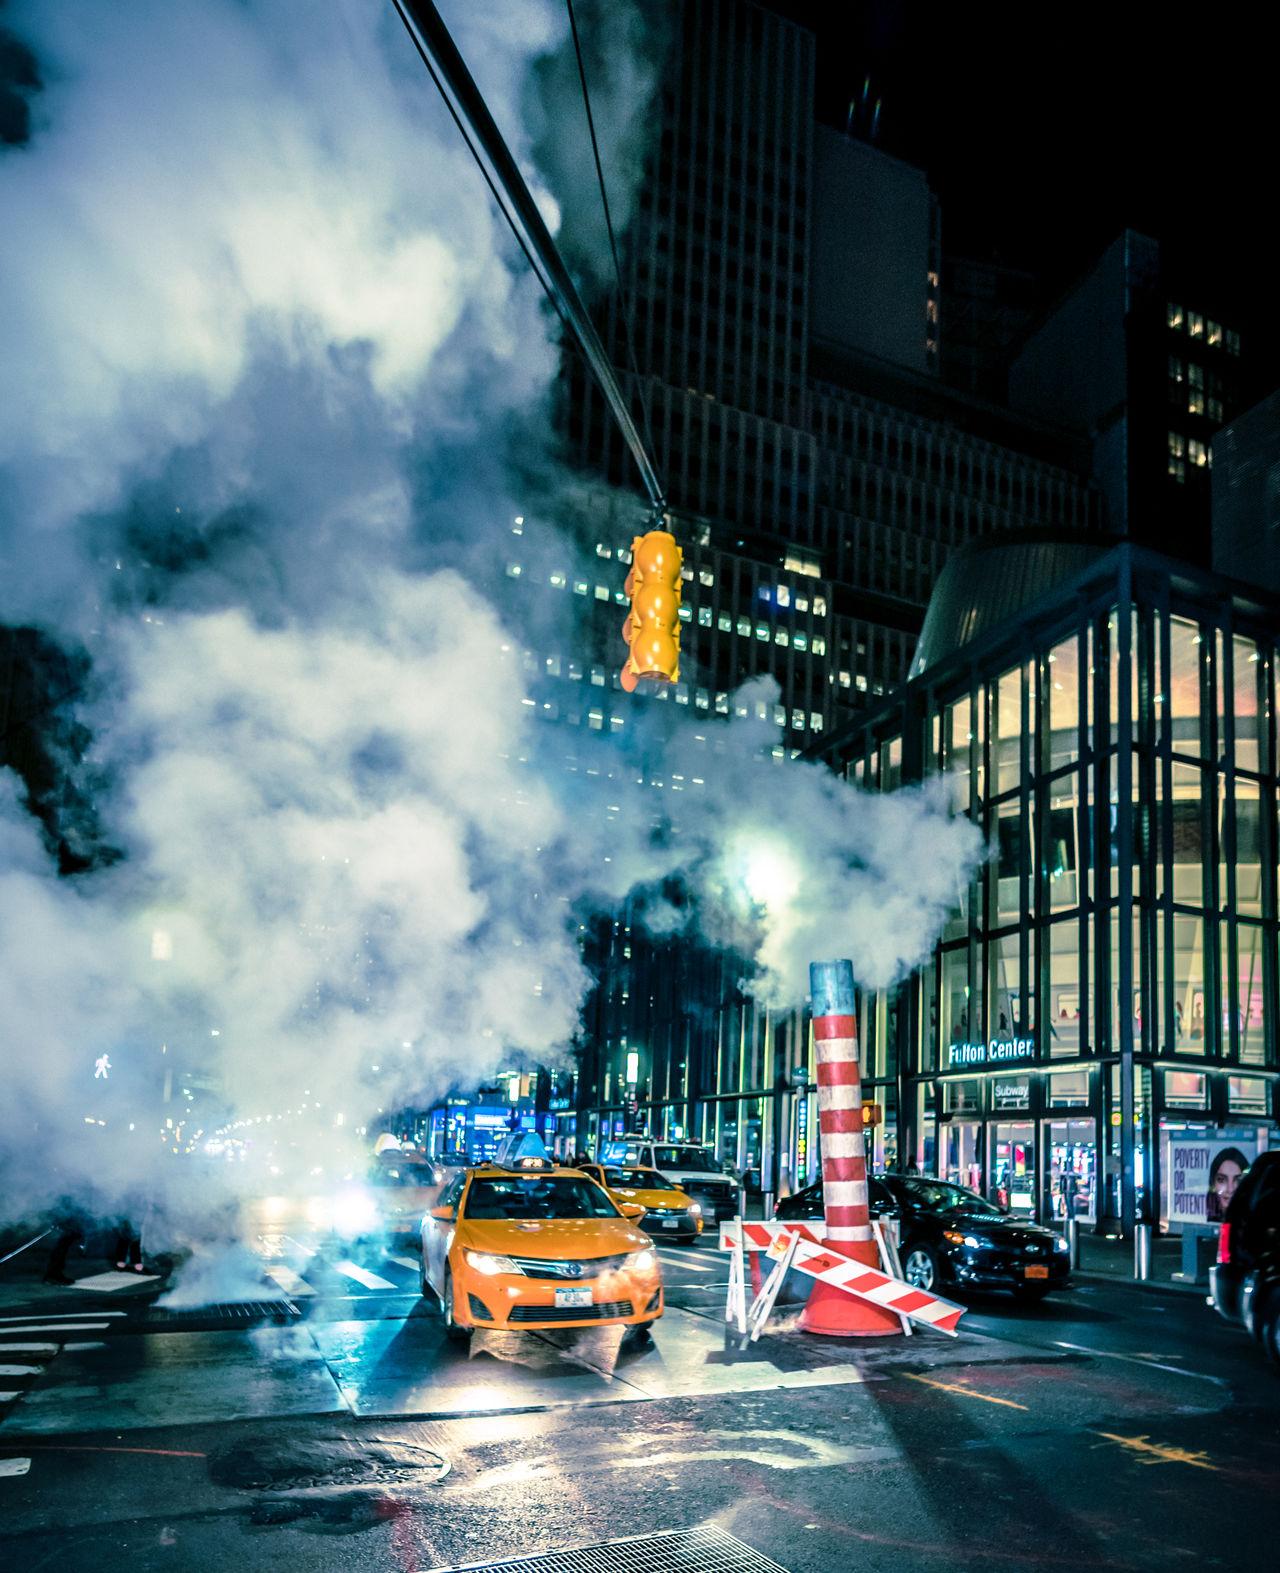 transportation, illuminated, mode of transportation, car, architecture